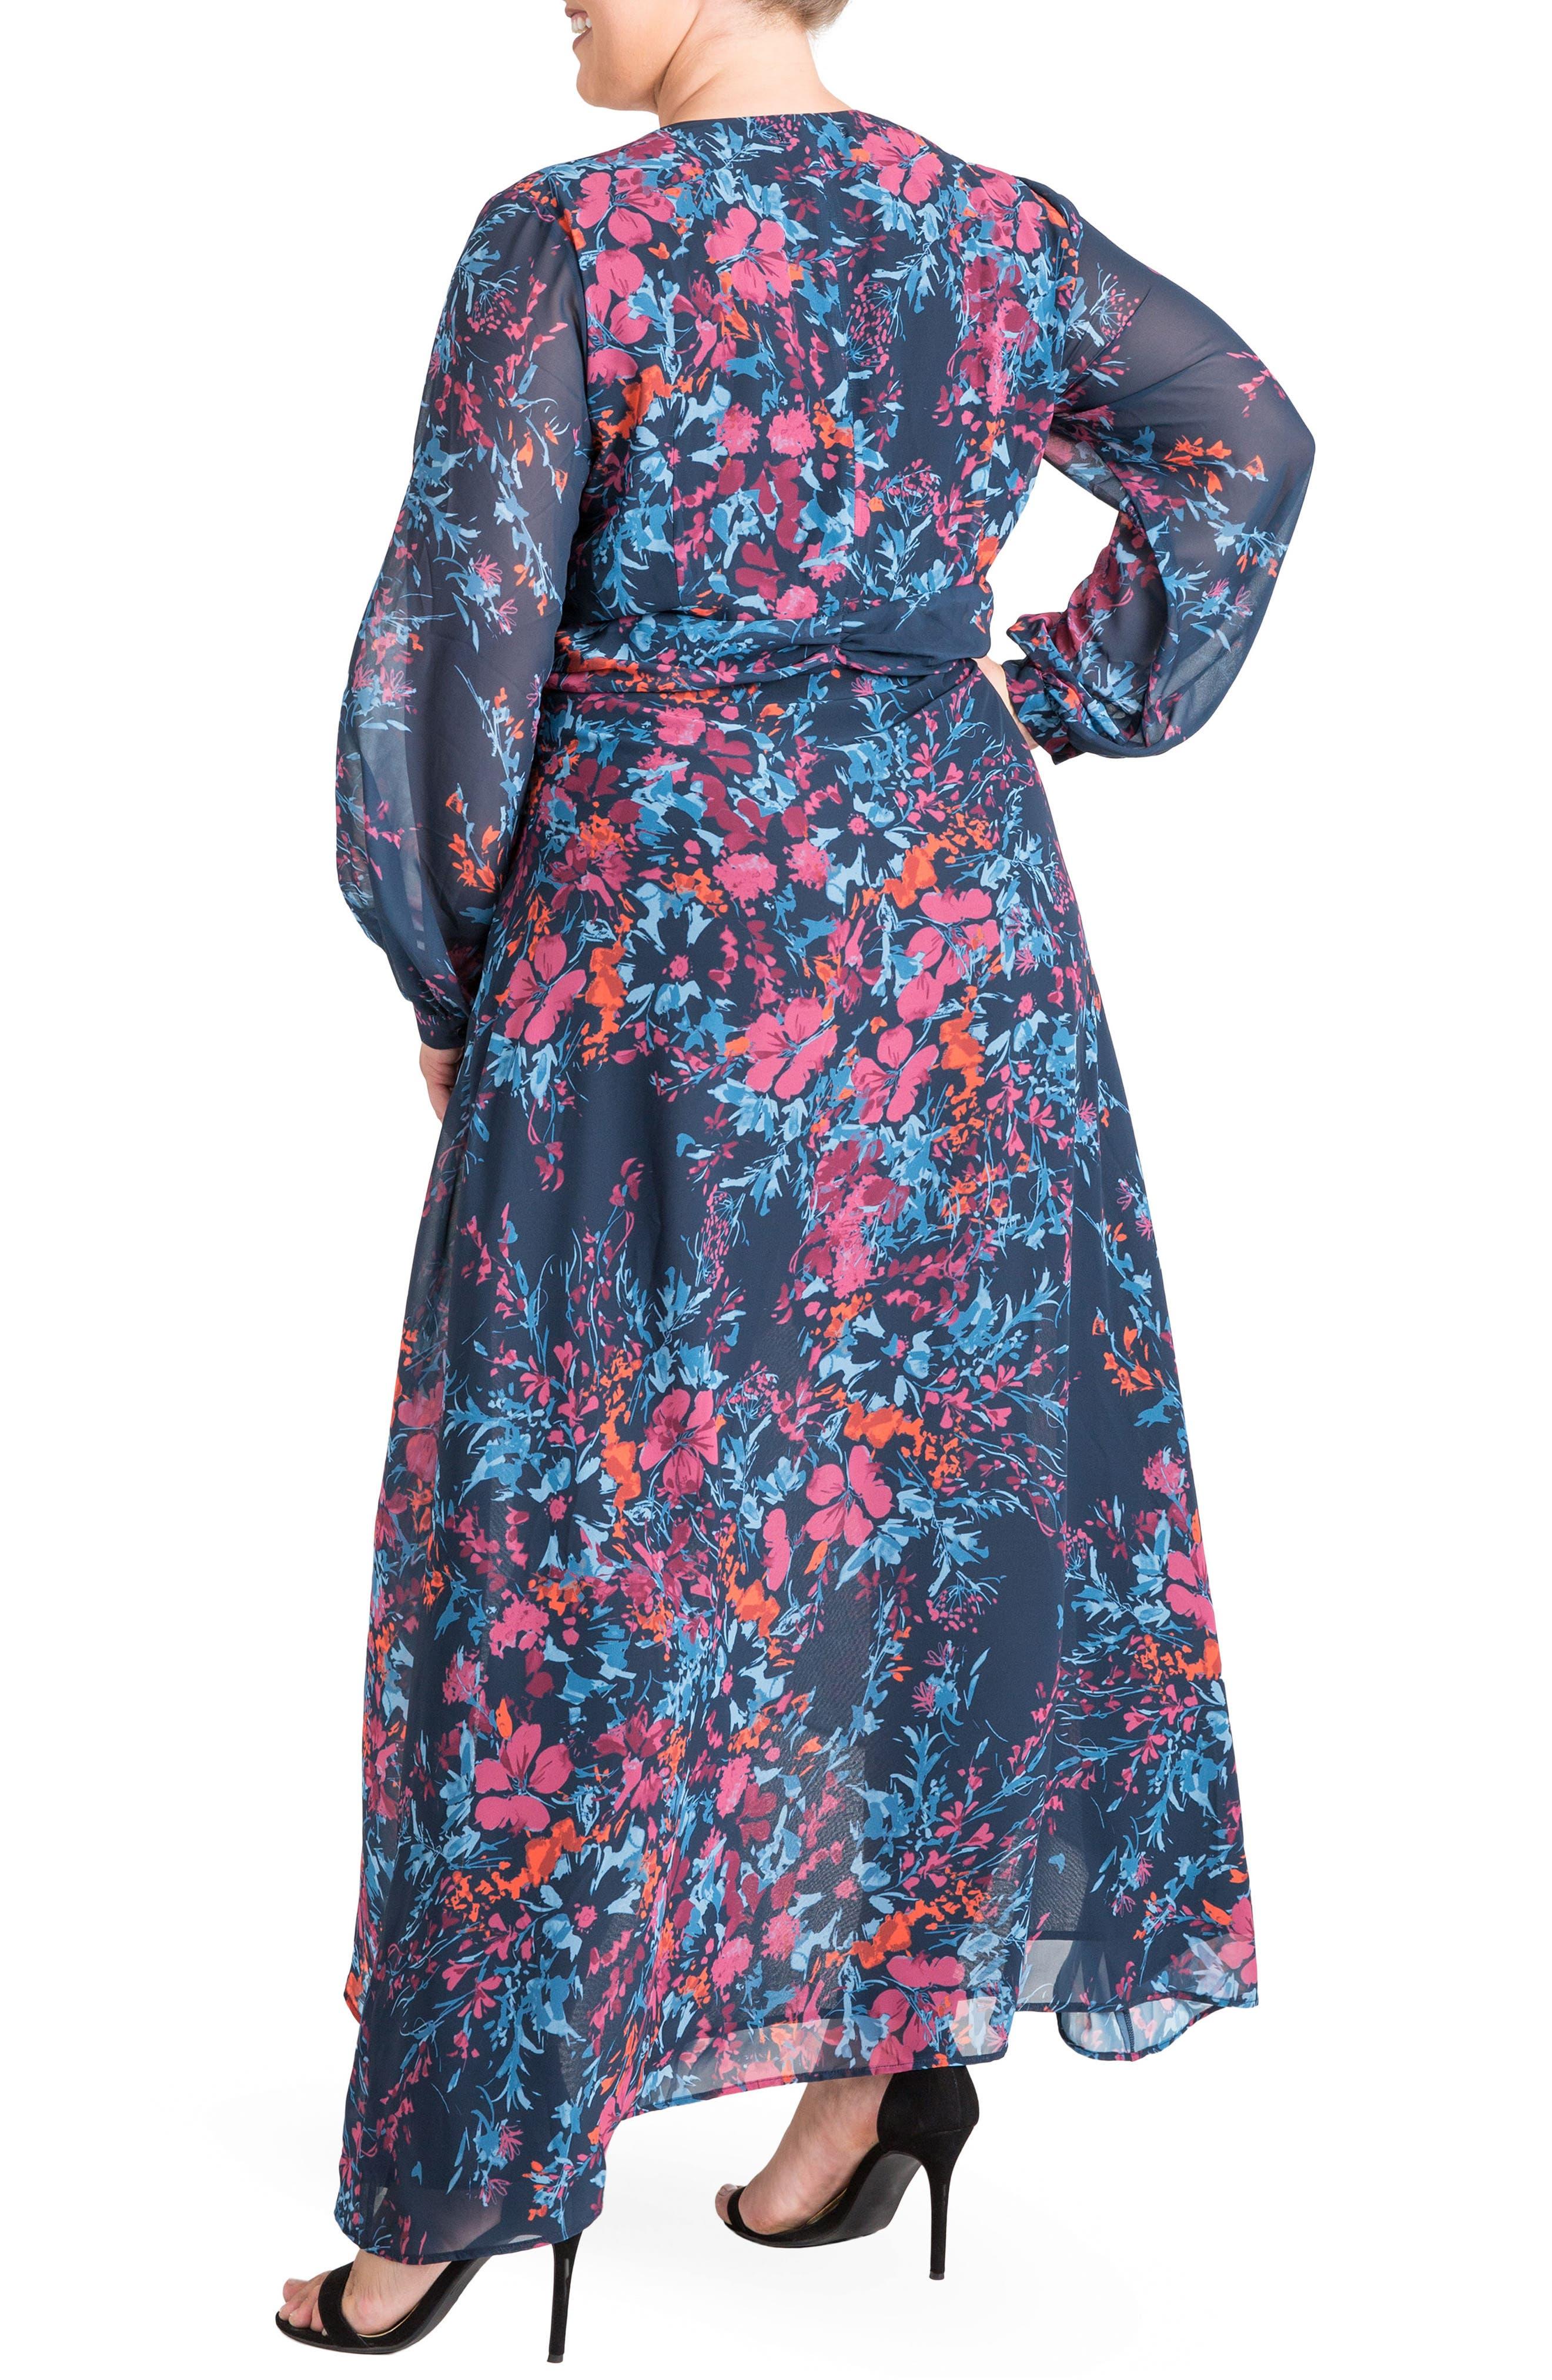 Floral Chiffon Maxi Dress,                             Alternate thumbnail 2, color,                             FLORAL PRINT